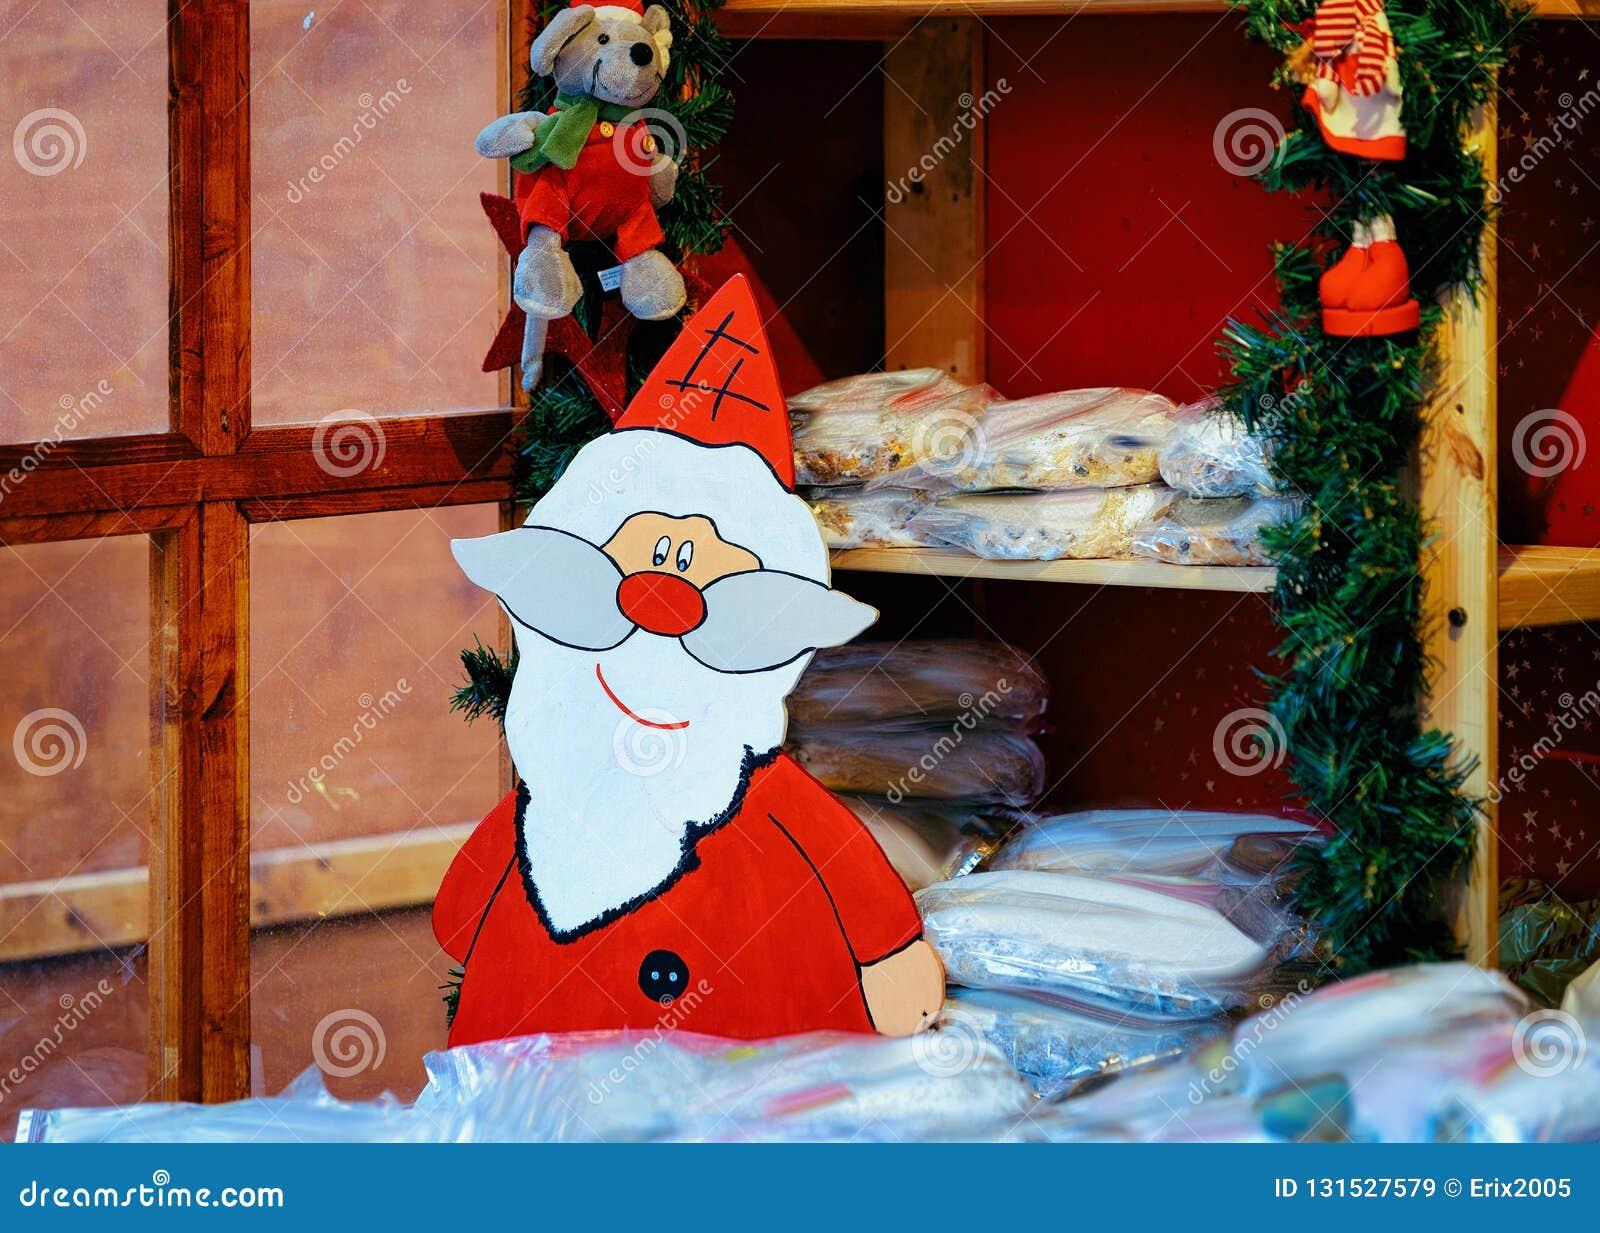 Christmas Bazaar Near Me.Santa Claus Figurine At Christmas Market Stall In Kaiser